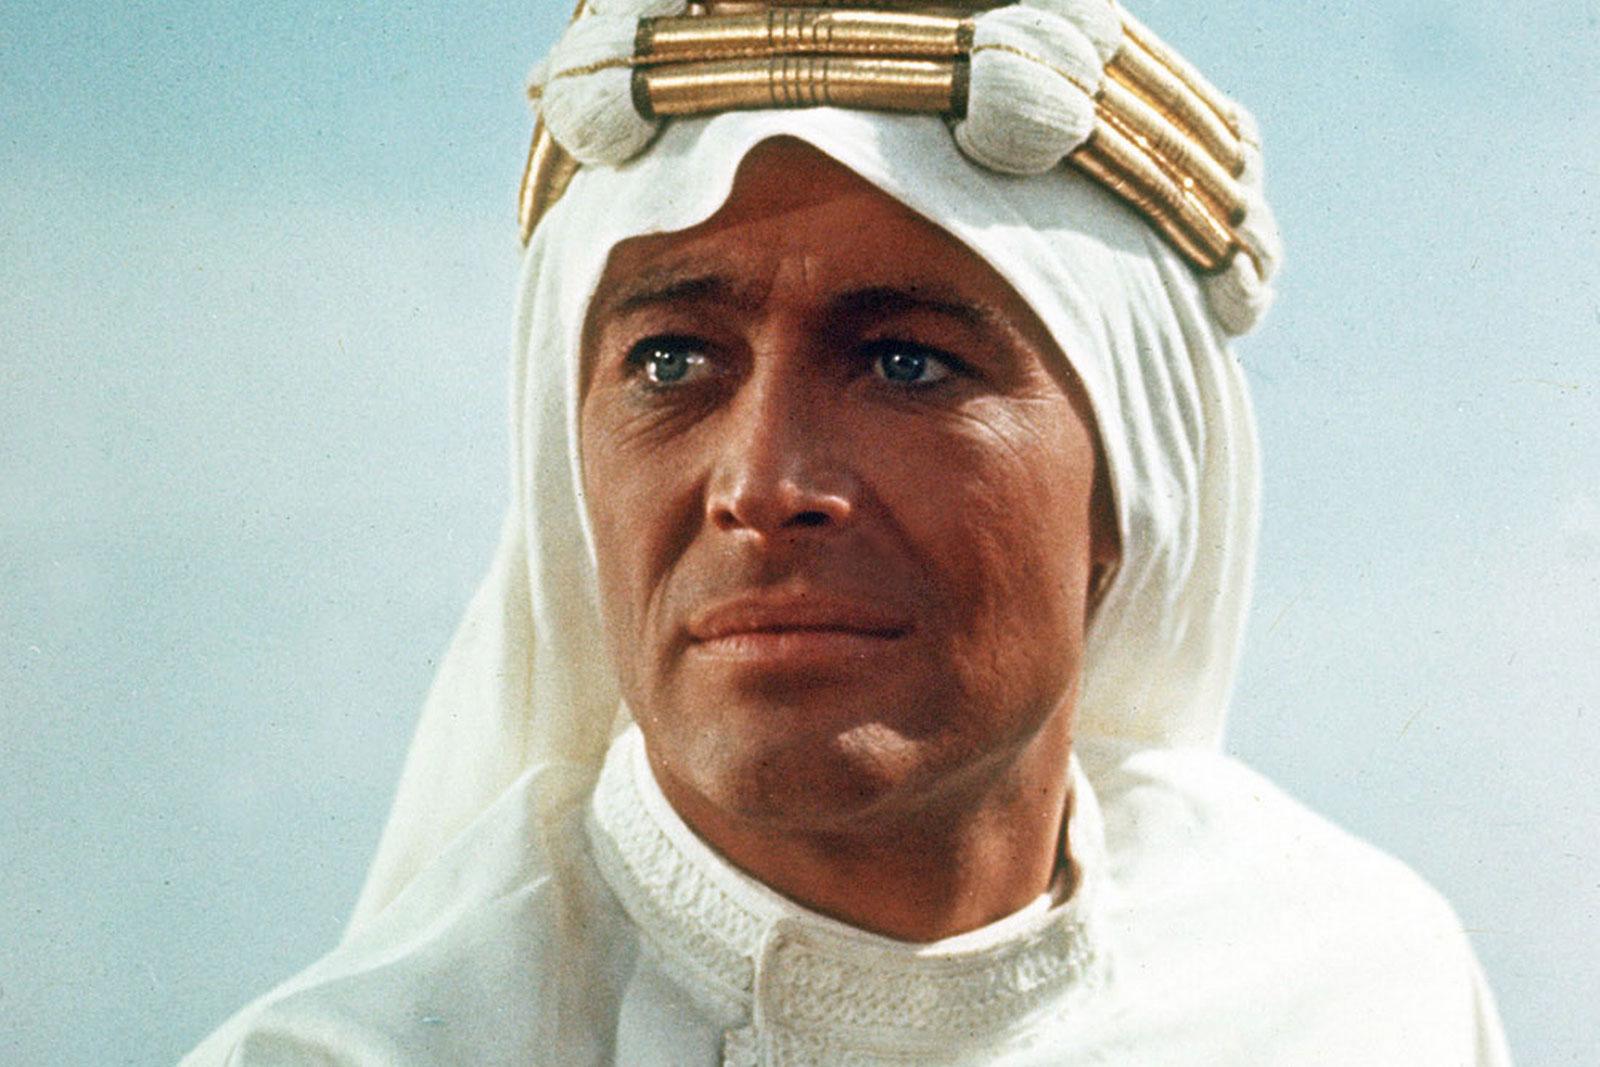 lawrence of arabia 1 - نقد فیلم Lawrence of Arabia (لورنس عربستان)